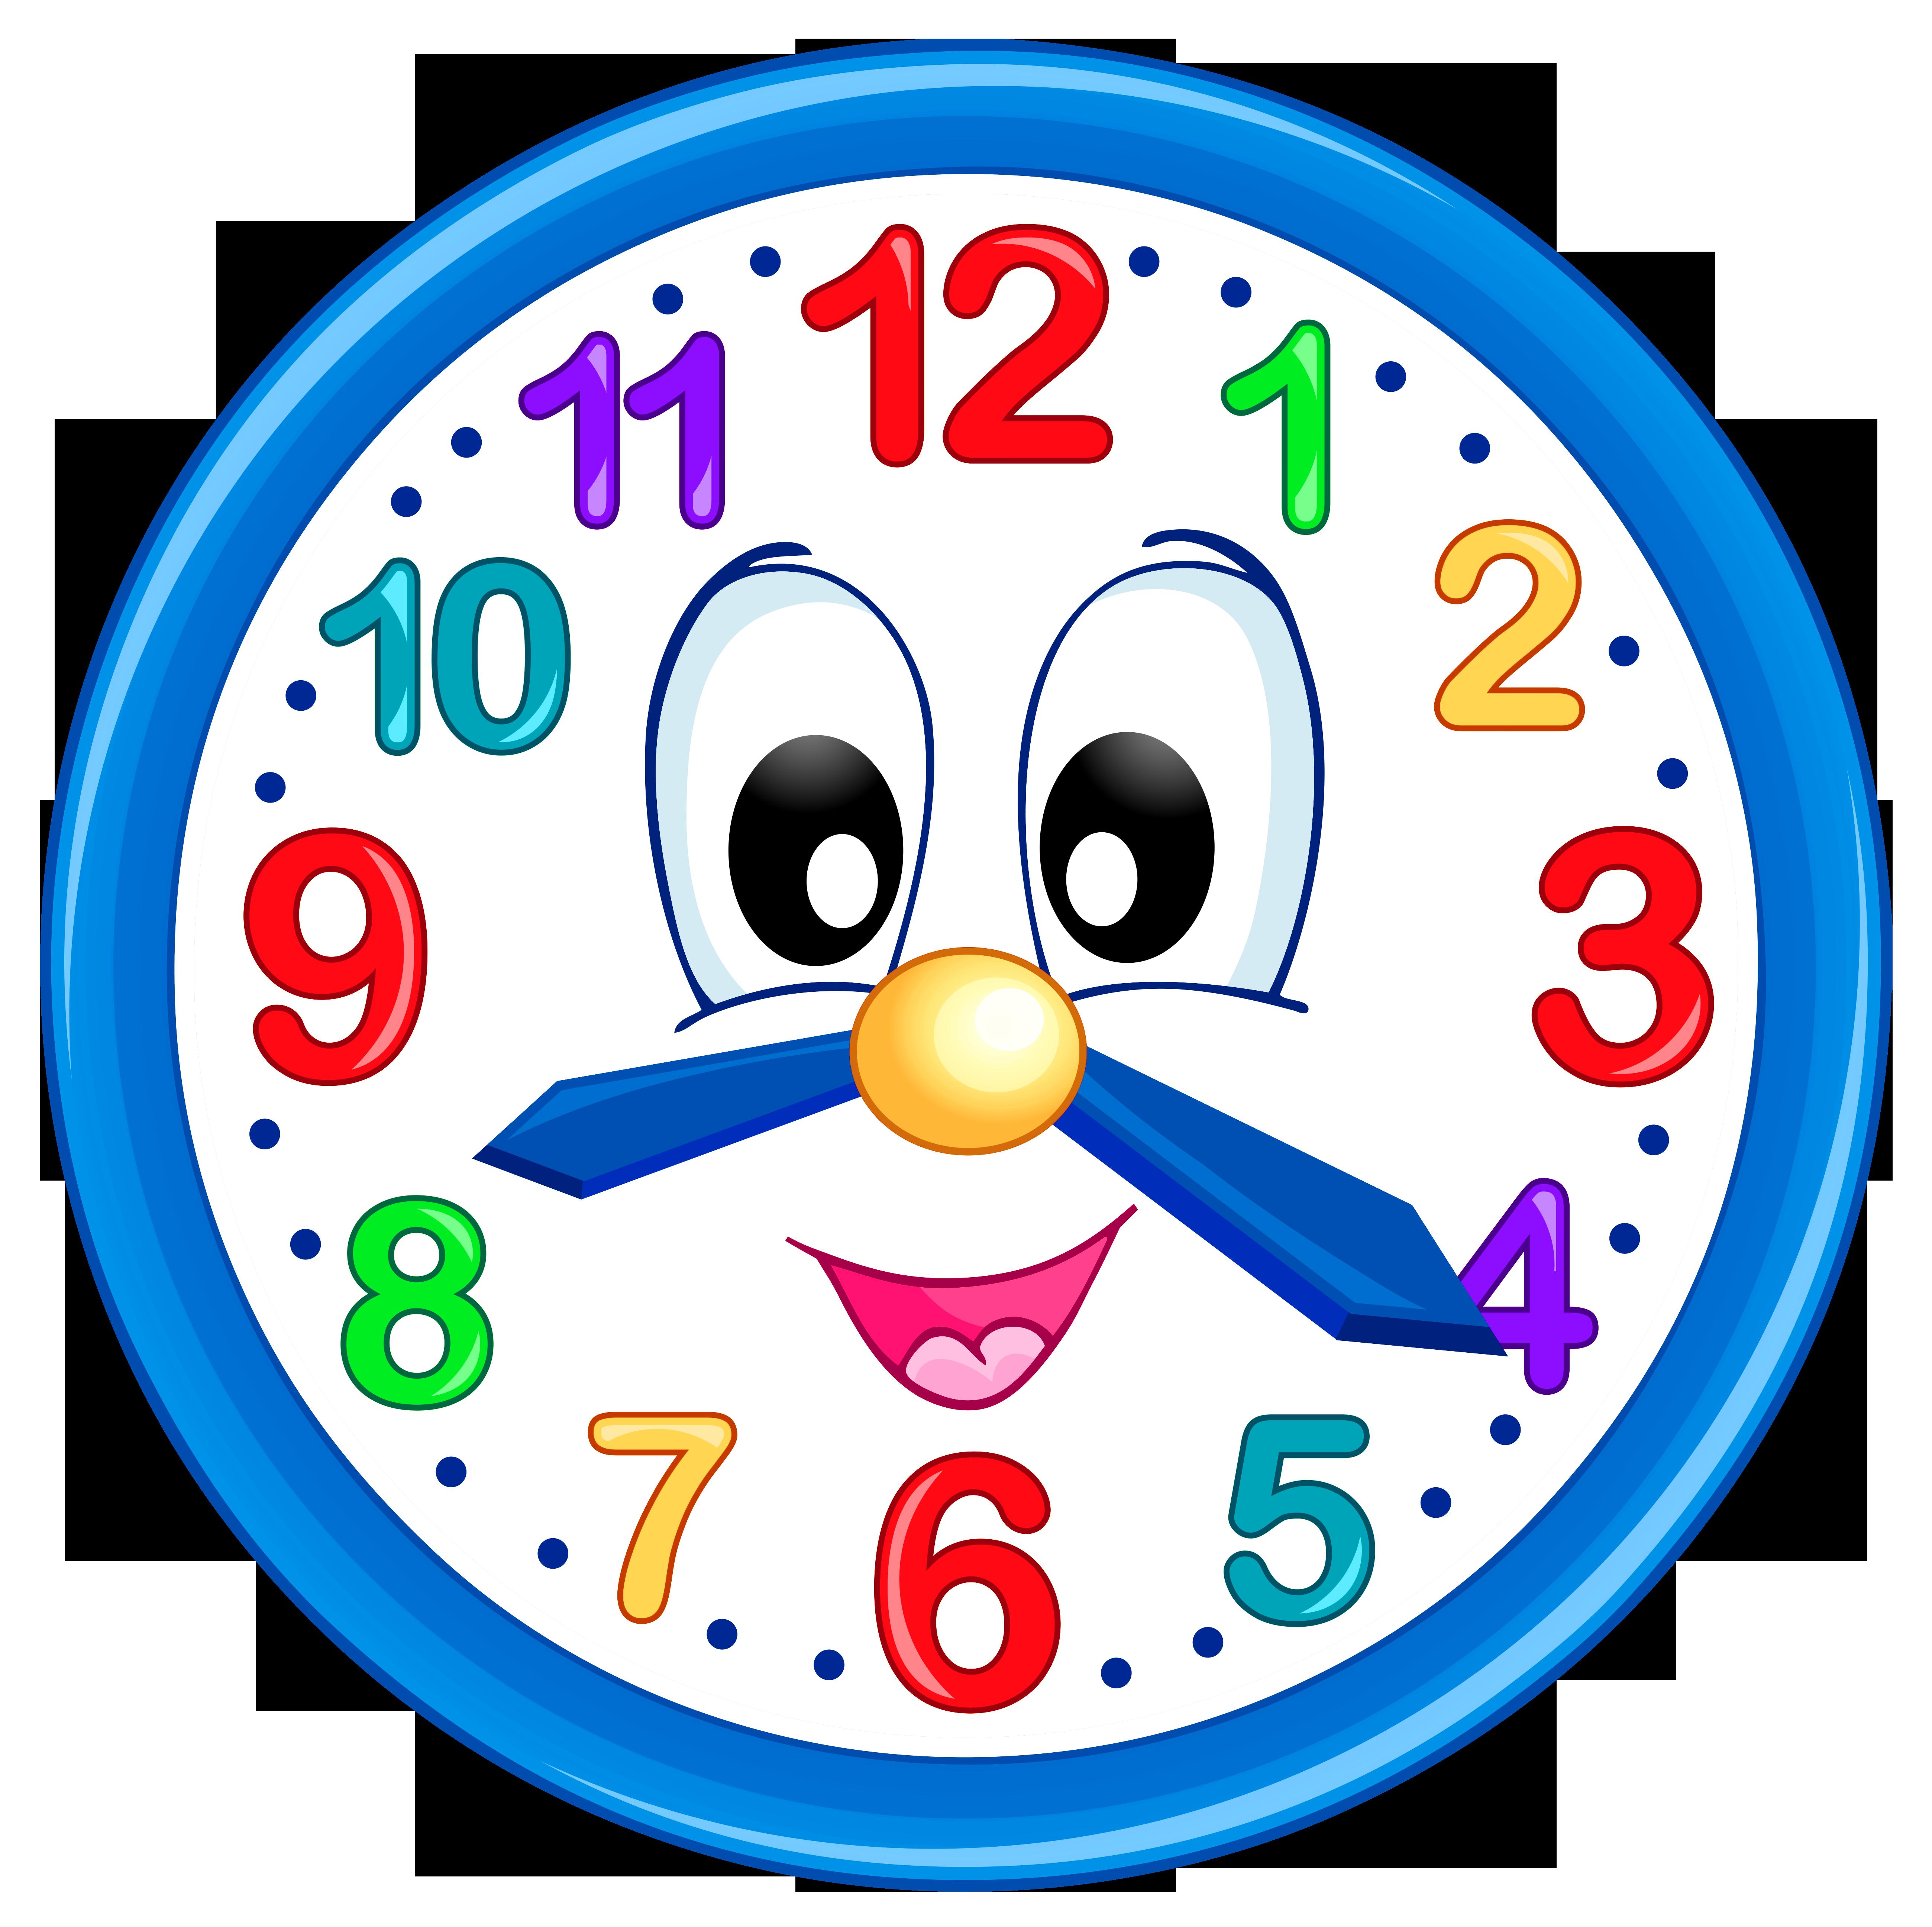 Clipart clock 12 am. I can t afford